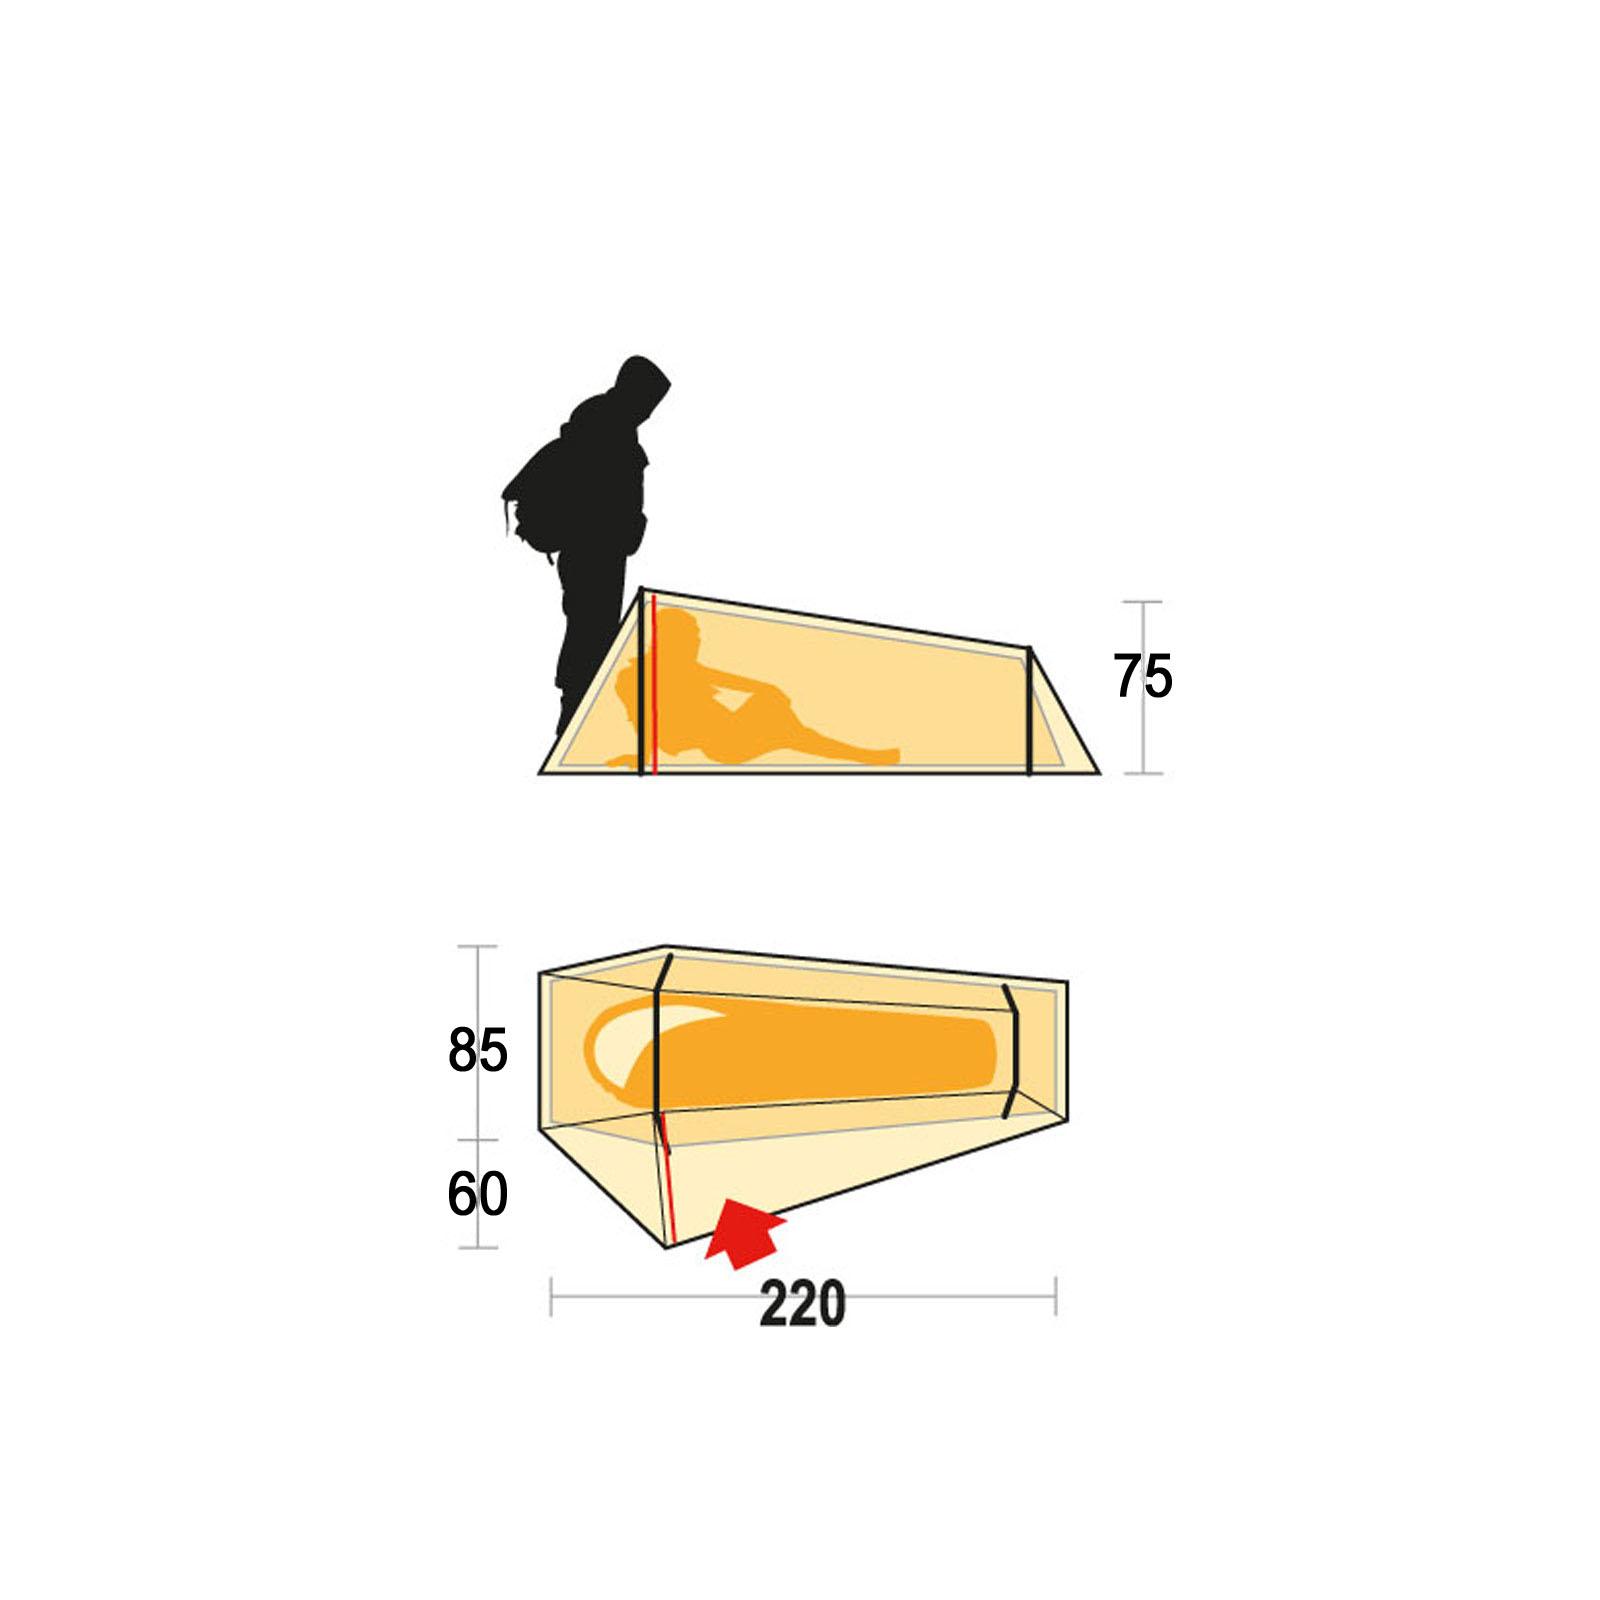 1 mann zelt ferrino lightent 1 personen trekkingzelt leichtzelt fahrrad camping ebay. Black Bedroom Furniture Sets. Home Design Ideas